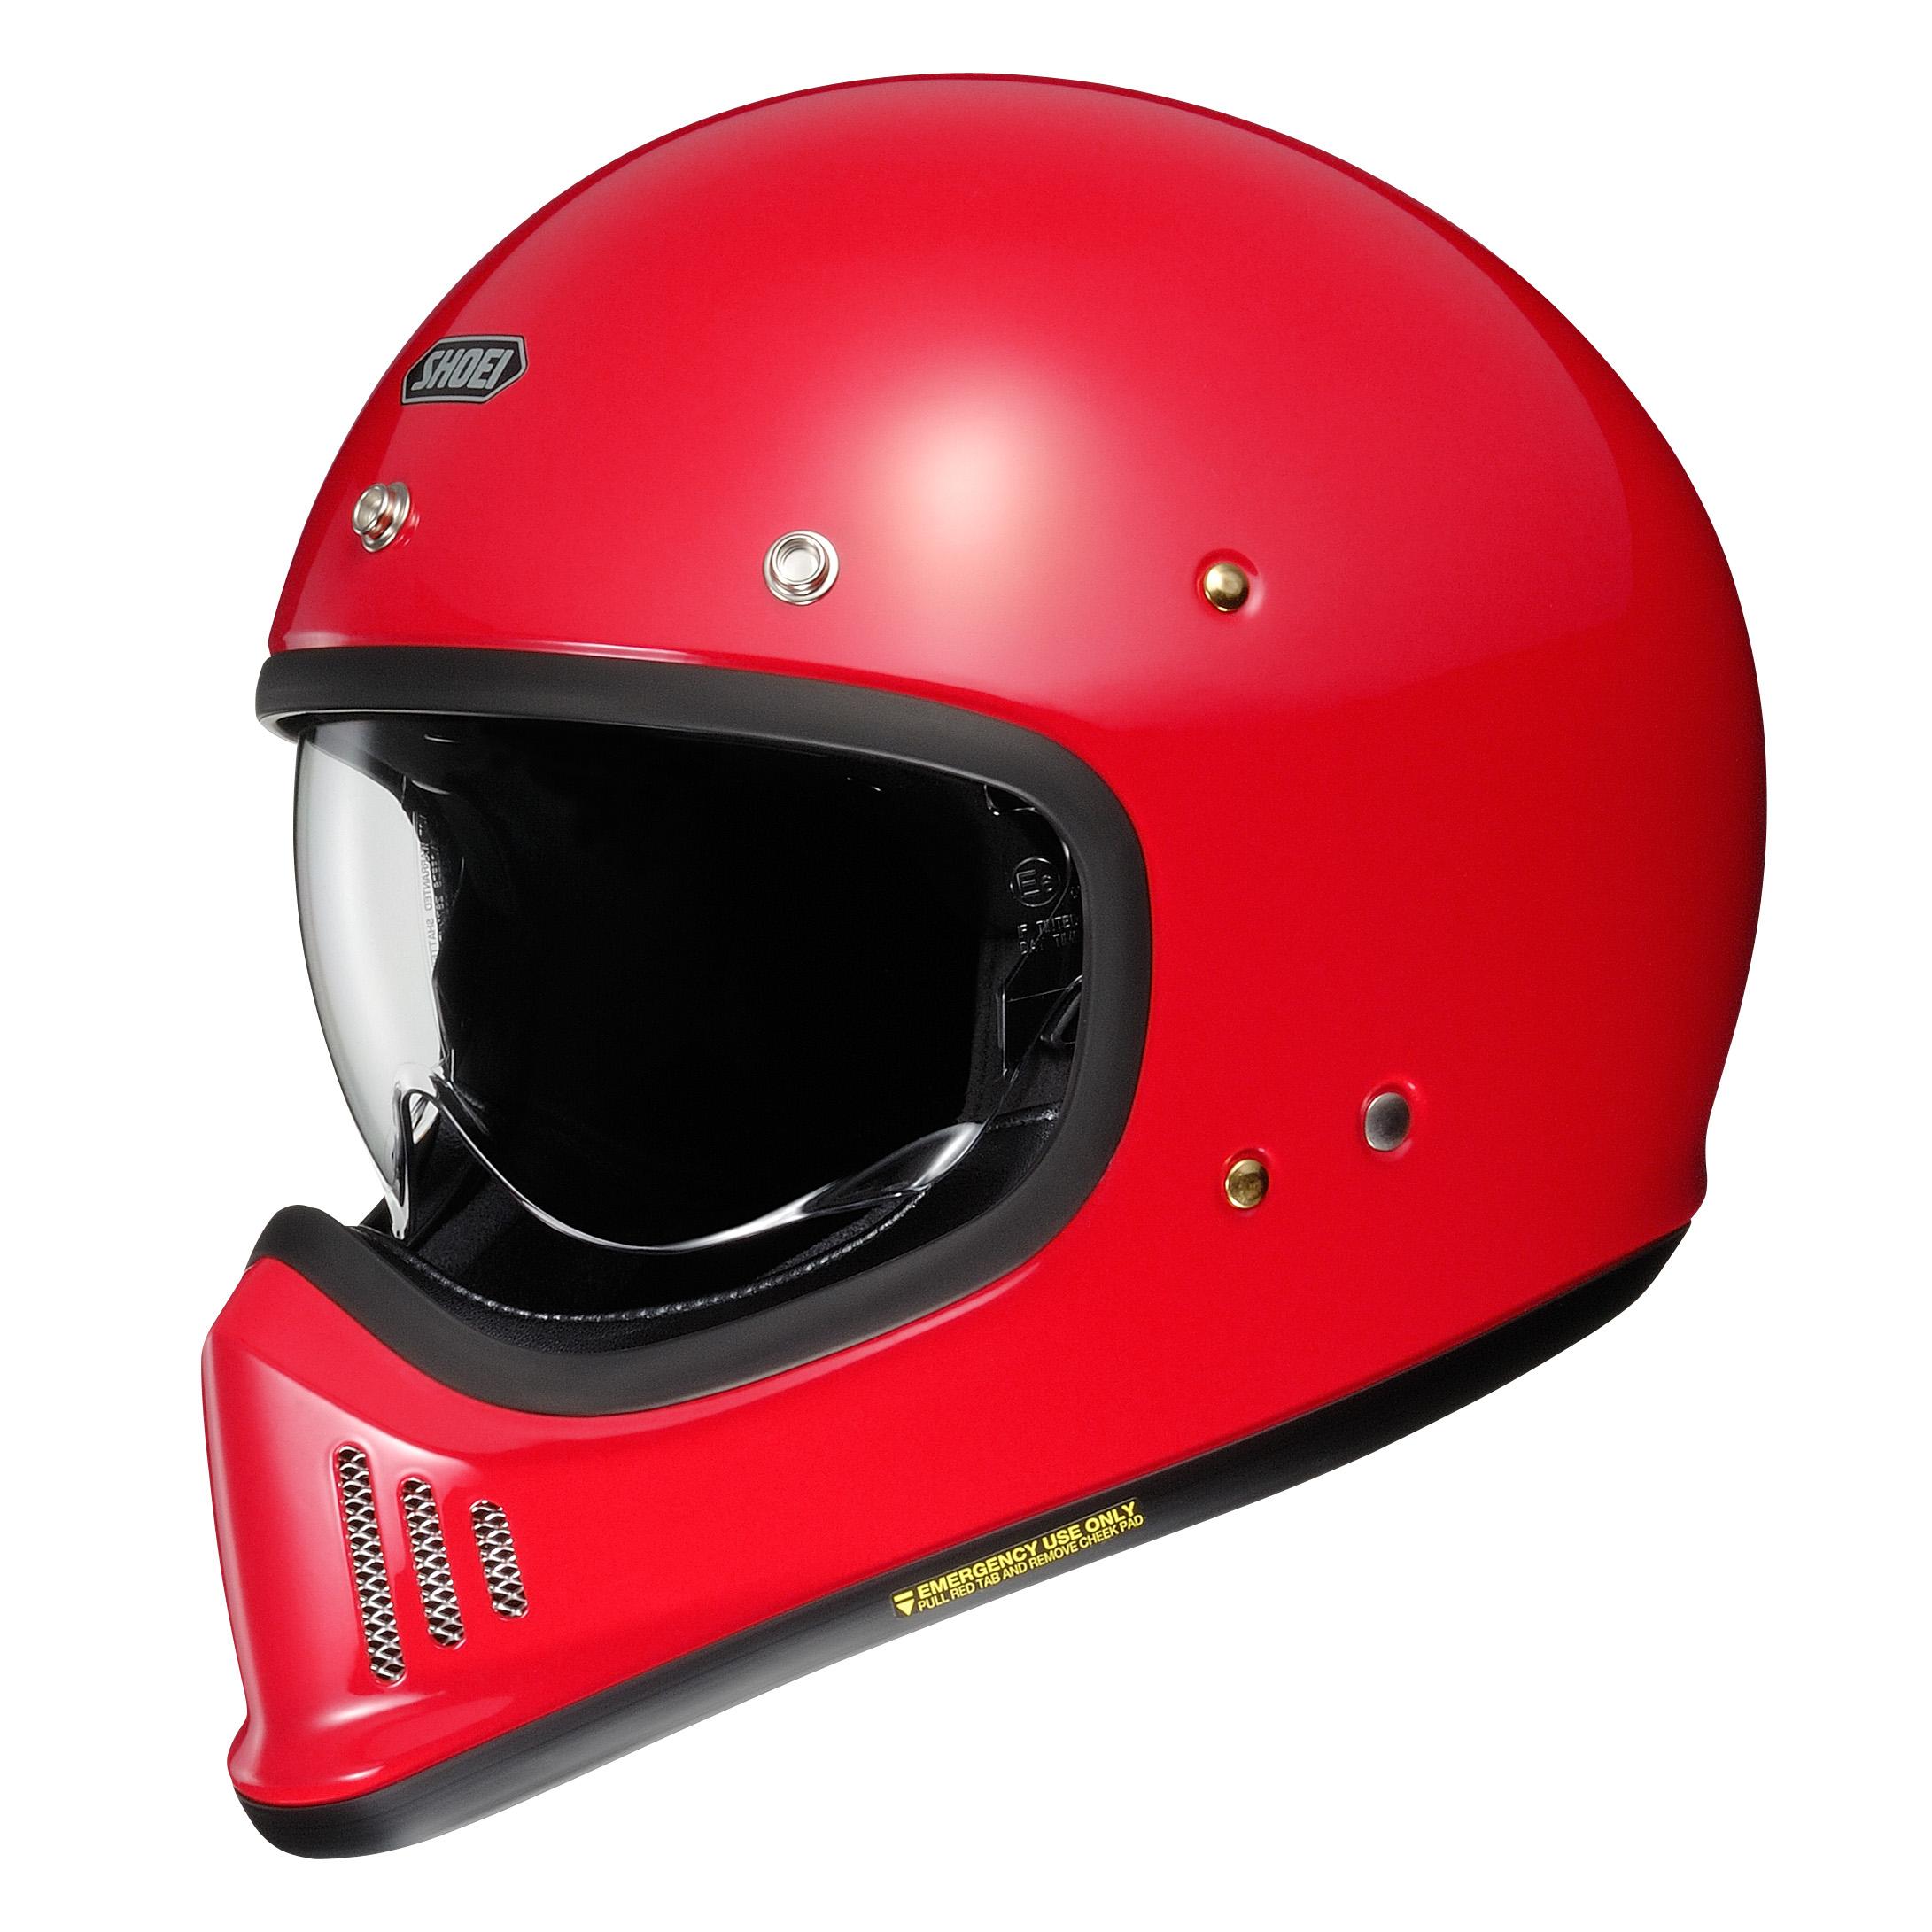 Shoei EX-Zero Shine Red Helmet